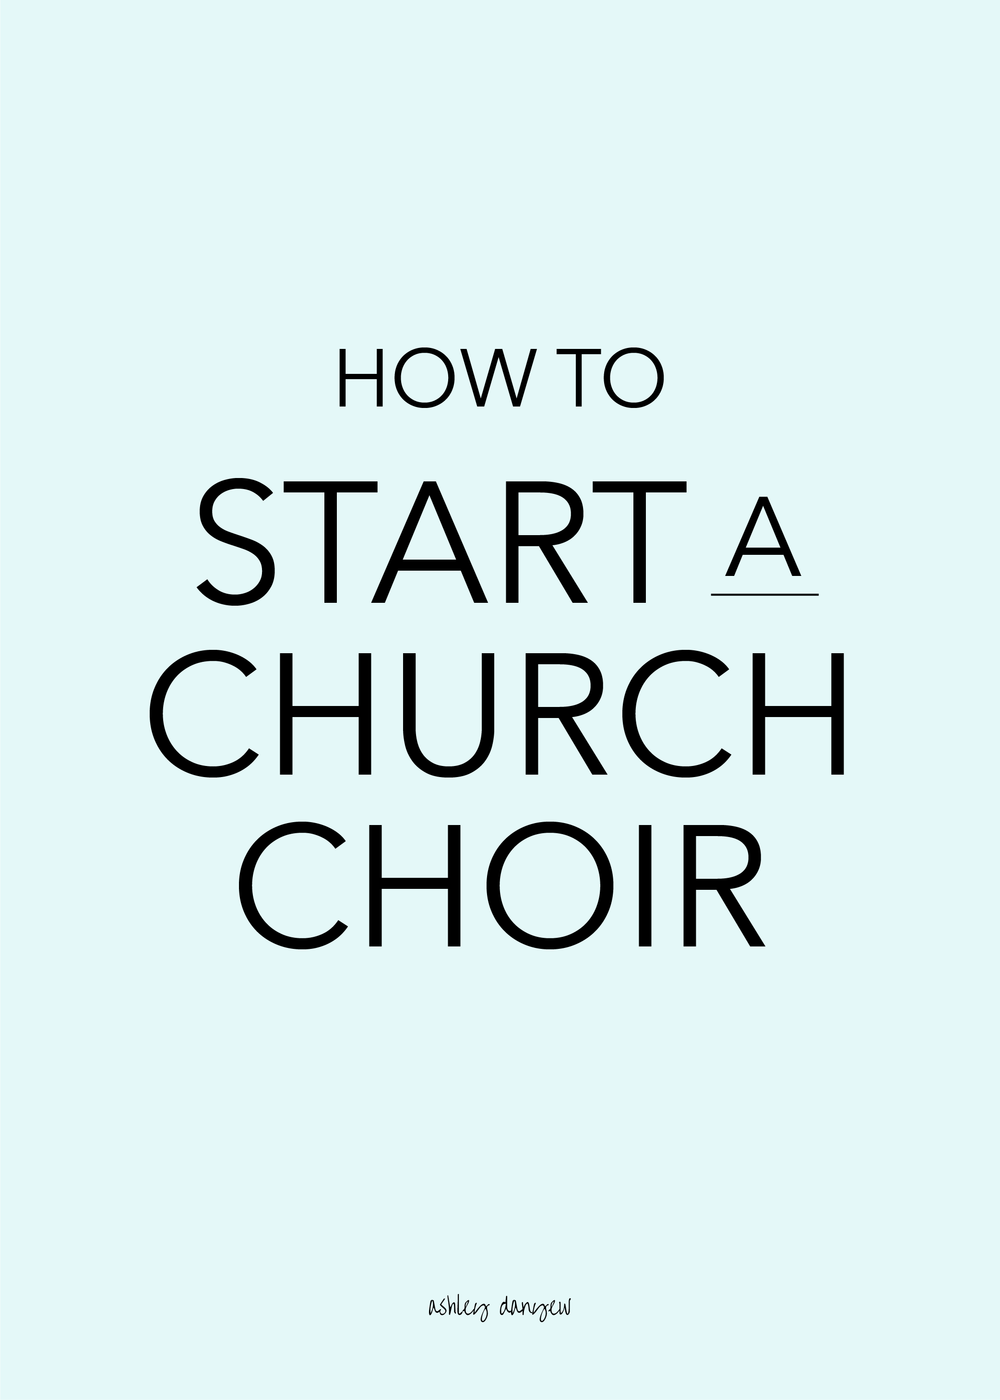 Copy of How to Start a Church Choir